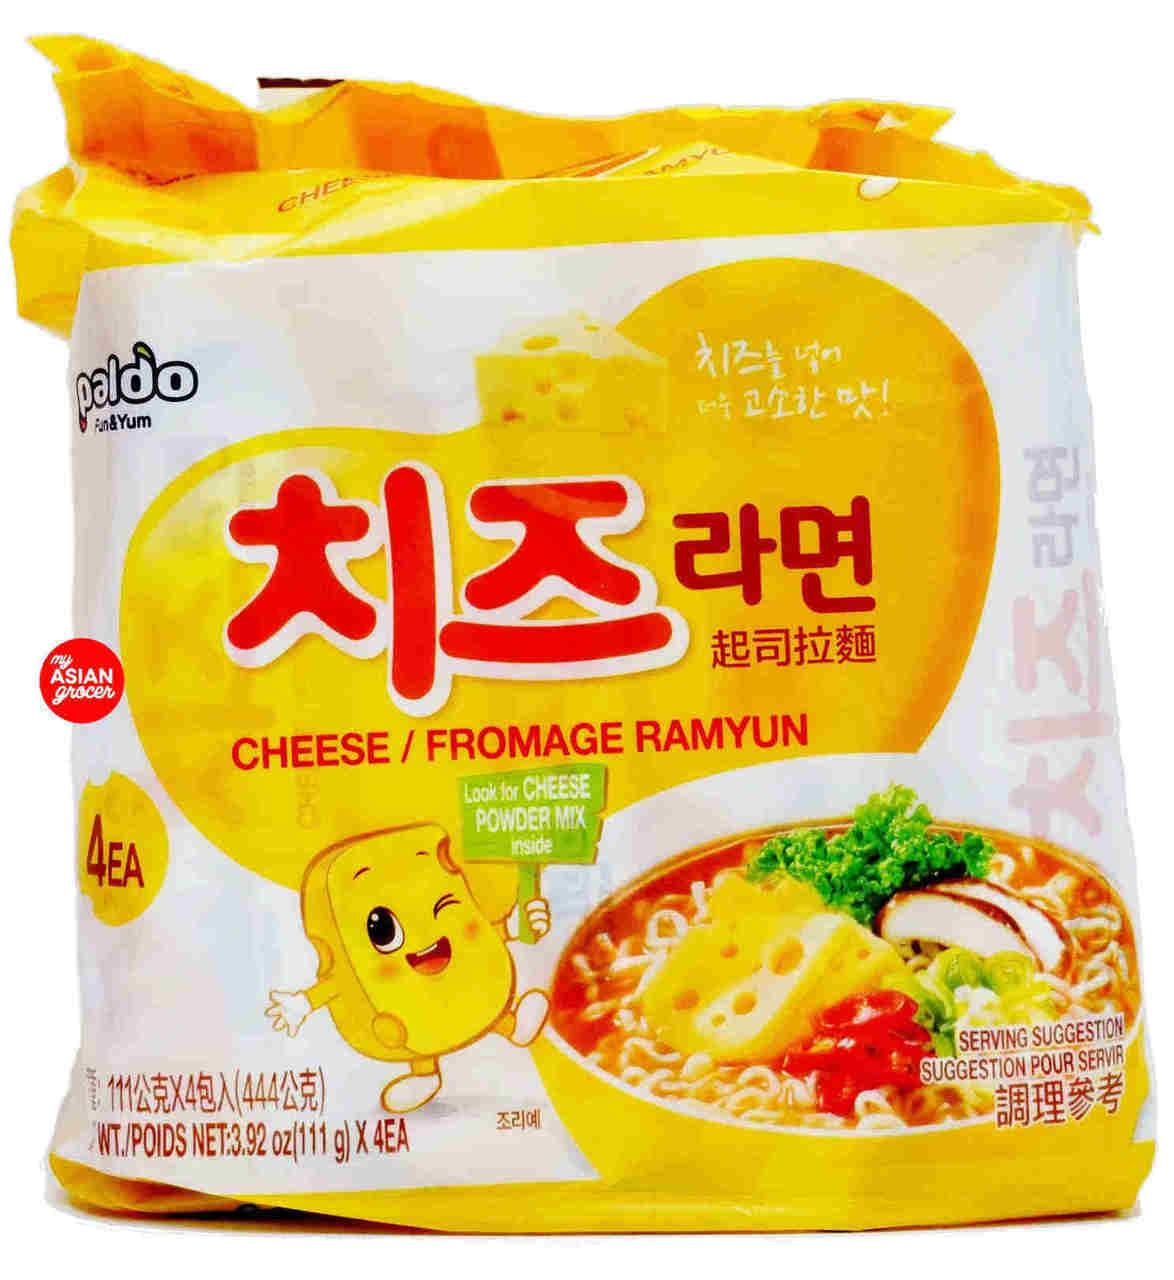 Sell Soon Veggie Ramyun Cheapest Best Quality Ph Store Paldo Bowl Noodle Shrimp Flavor 86 Gram Php 339 4 Pcs Cheese